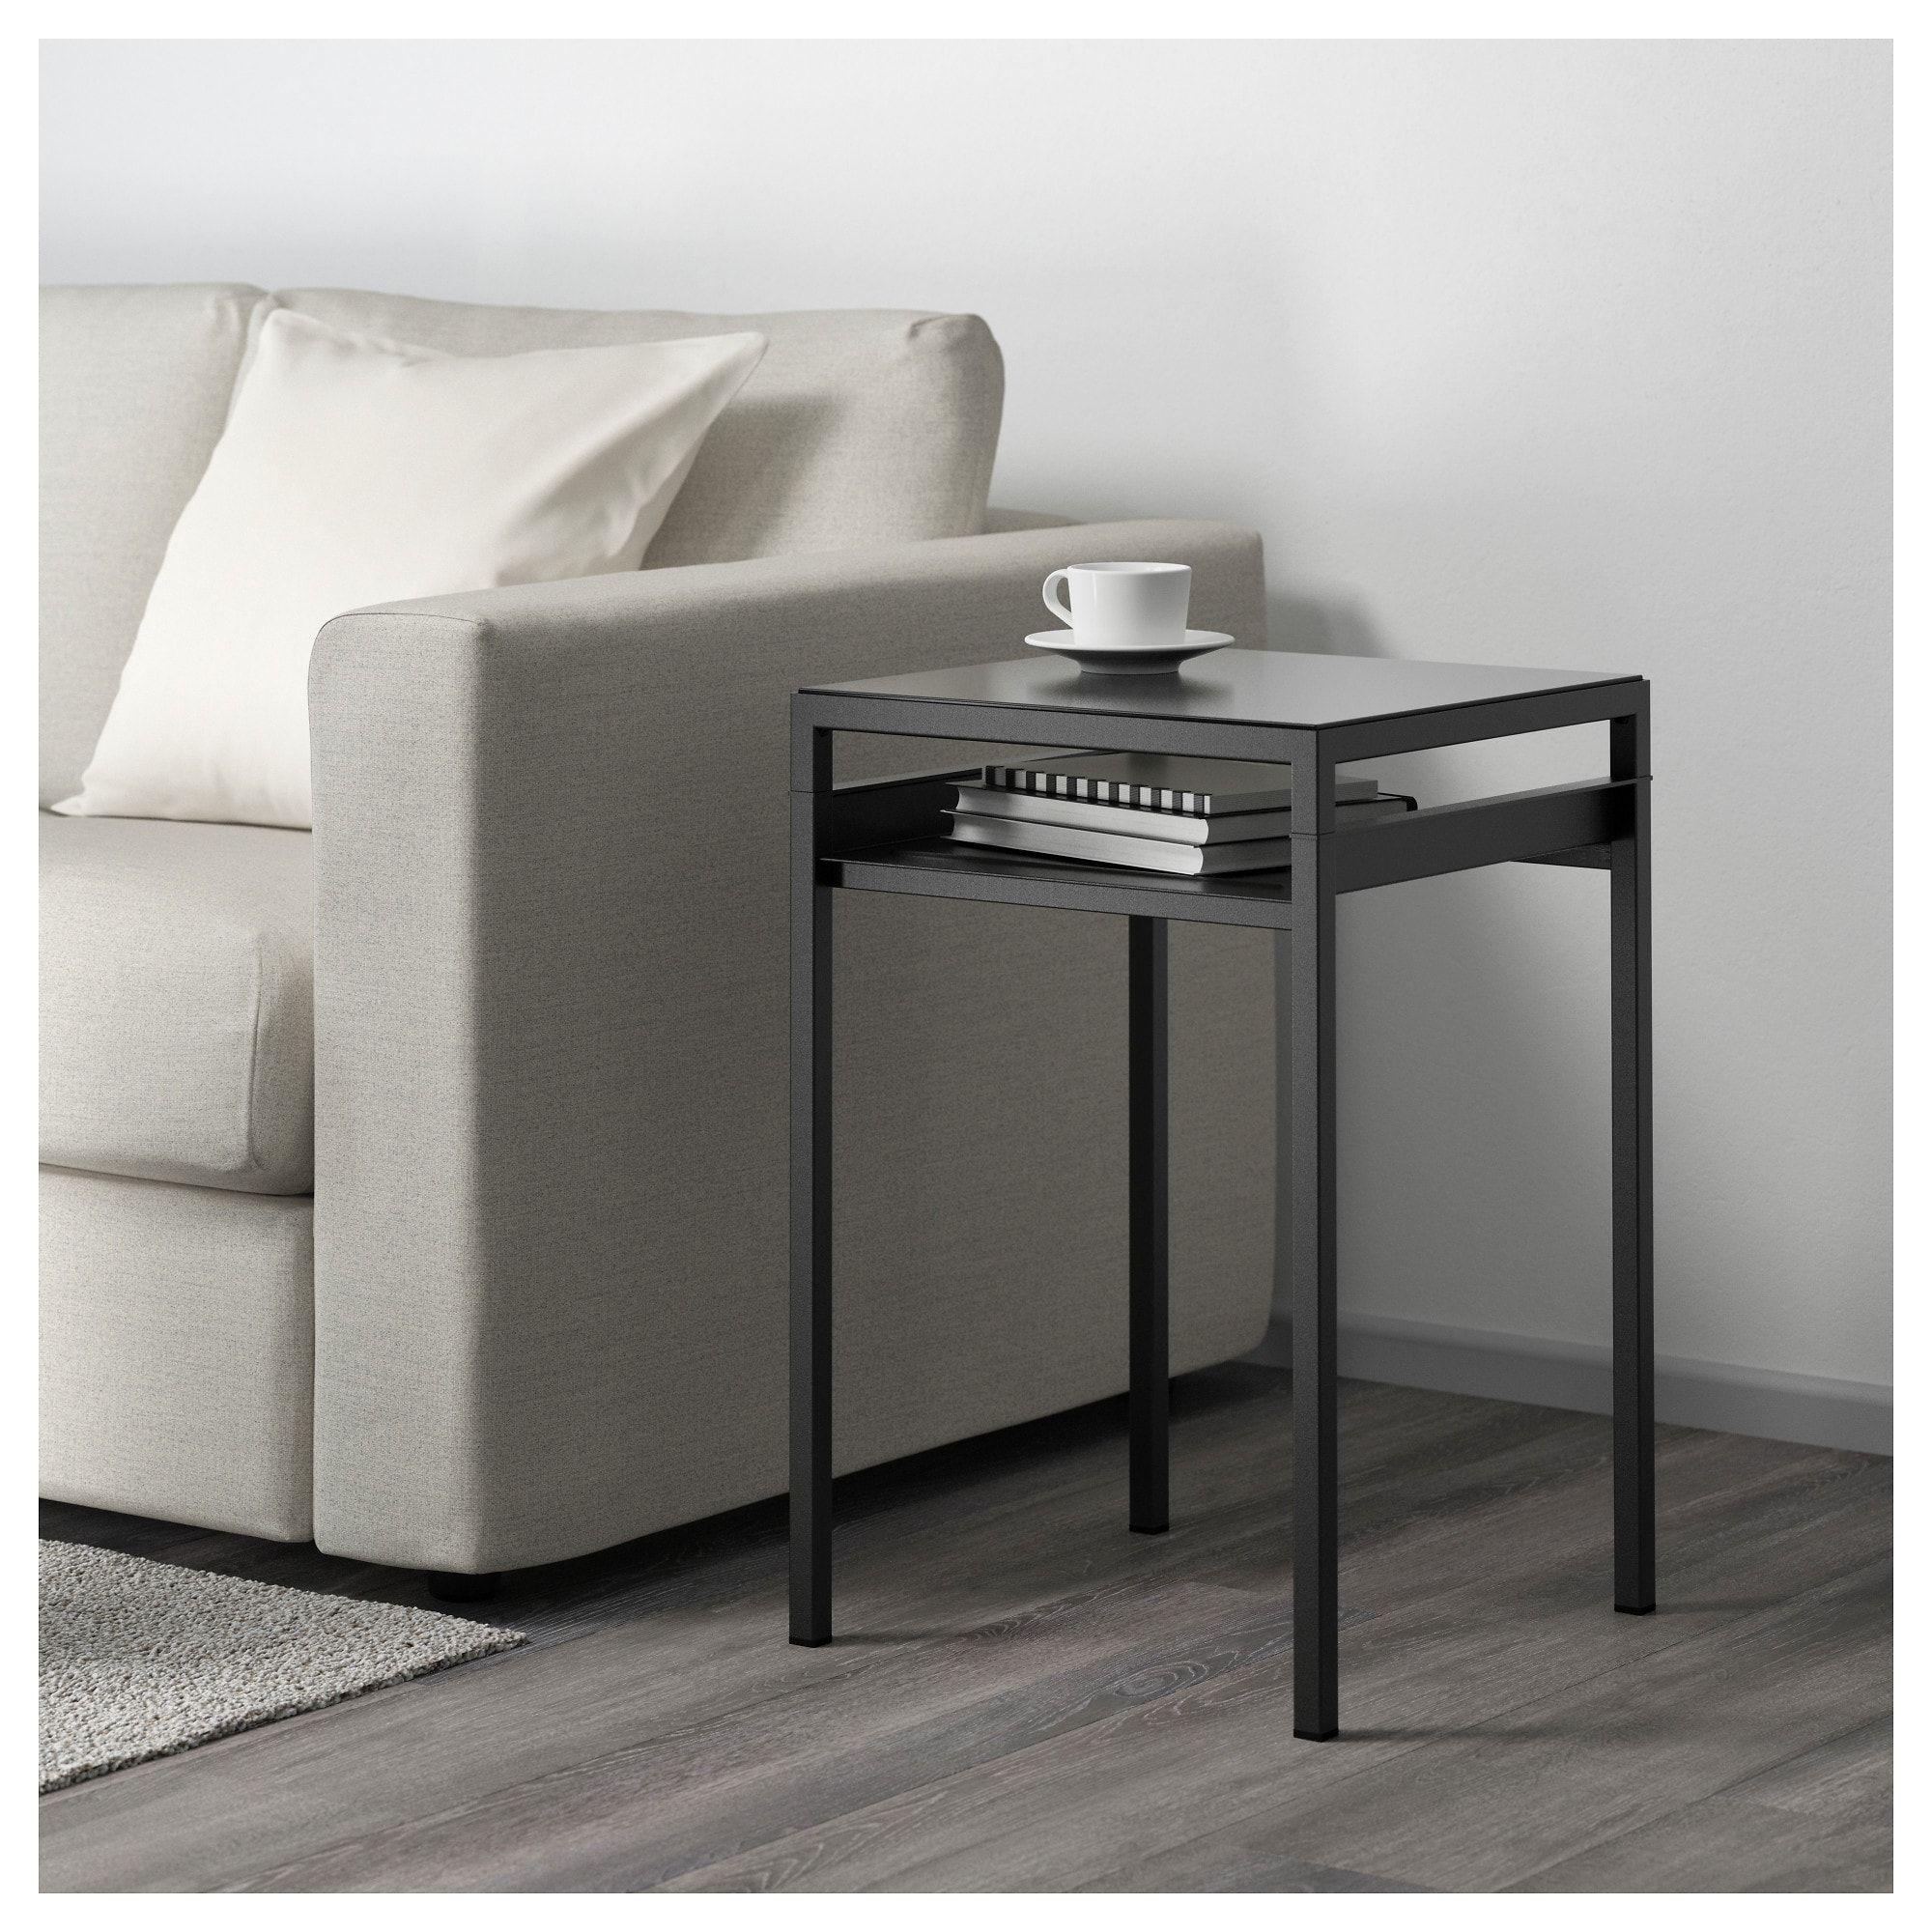 Ikea Us Furniture And Home Furnishings Ikea Side Table Furniture [ 2000 x 2000 Pixel ]